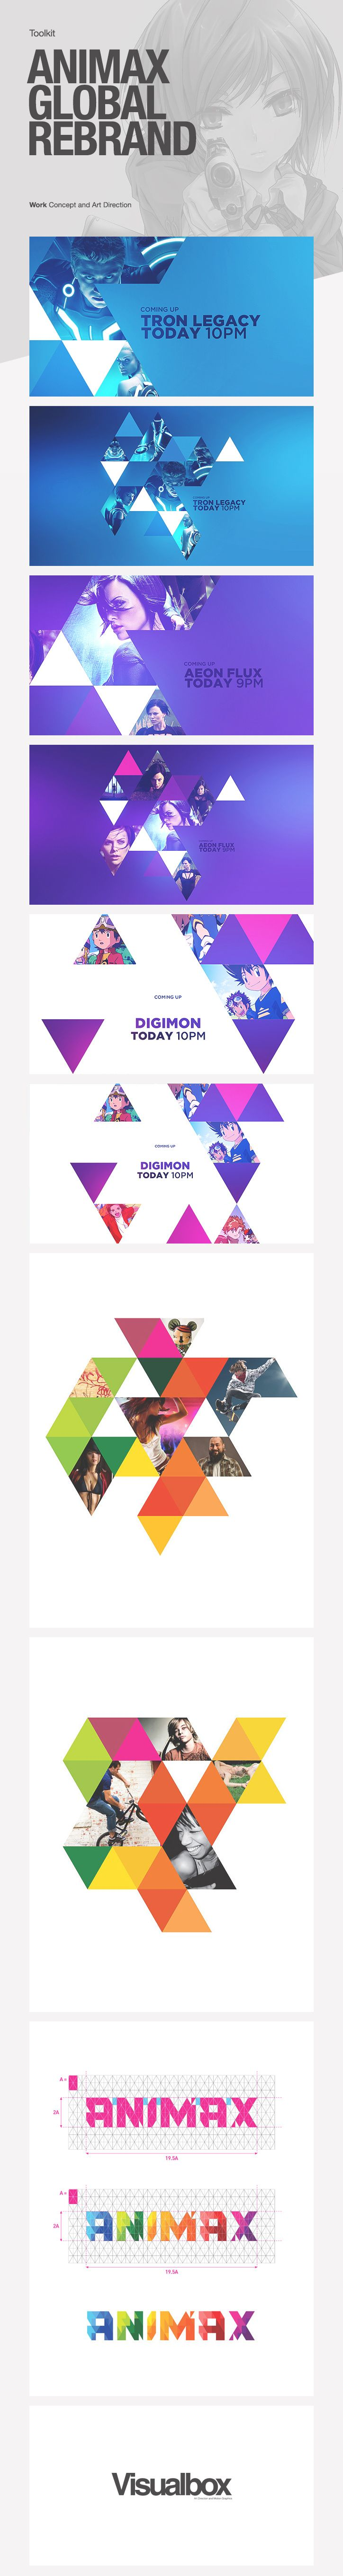 Animax Global Rebrand